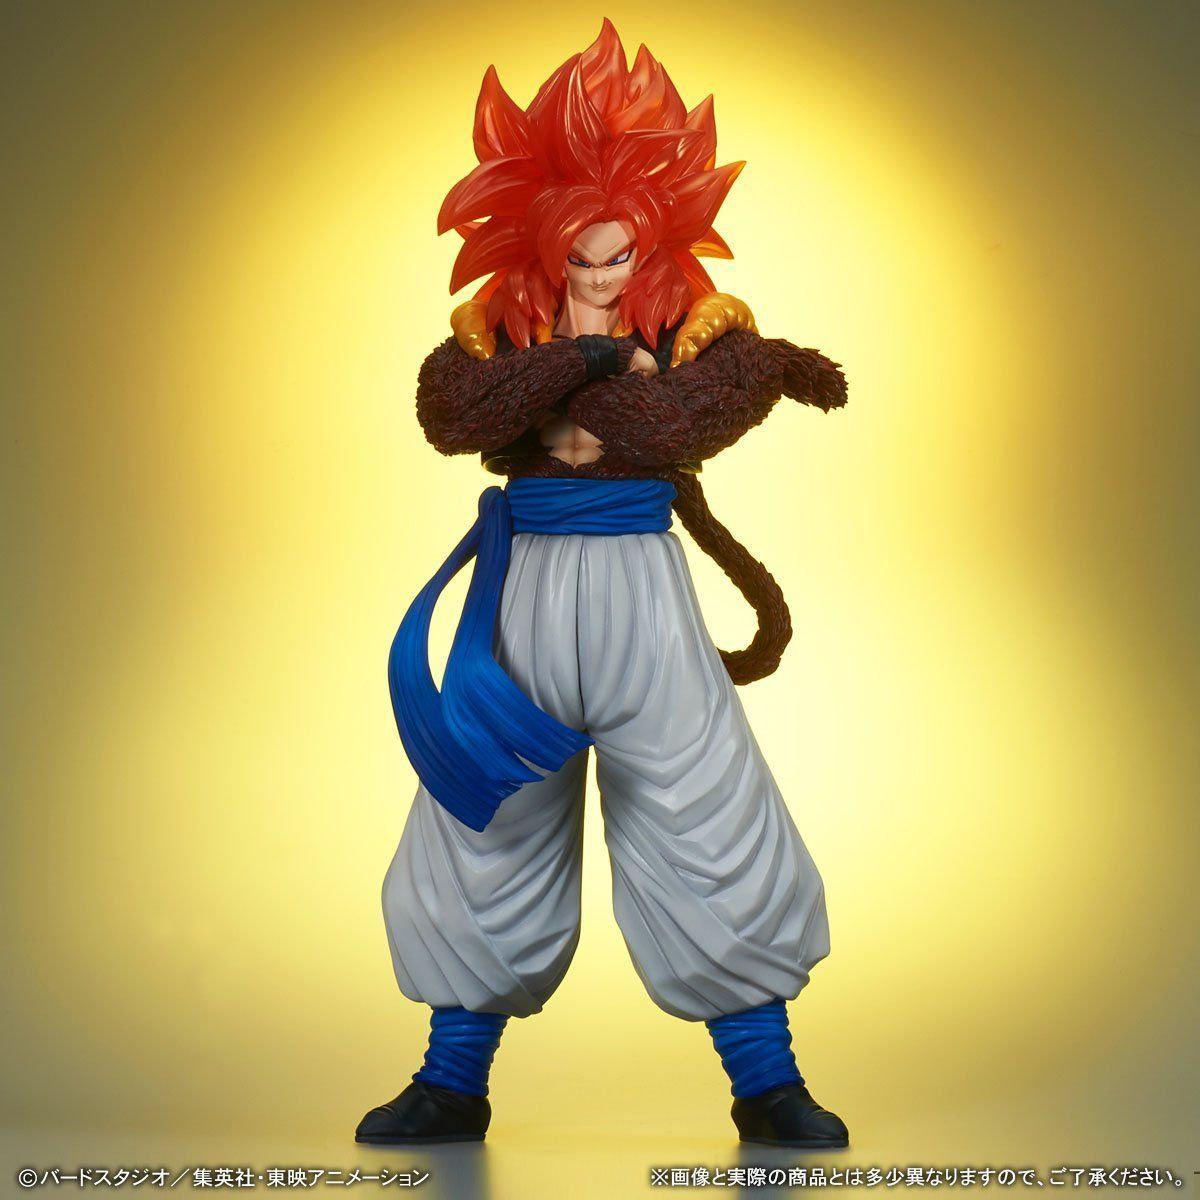 X Plus Gigantic Series Dragon Ball Gt Ss4 Gogeta